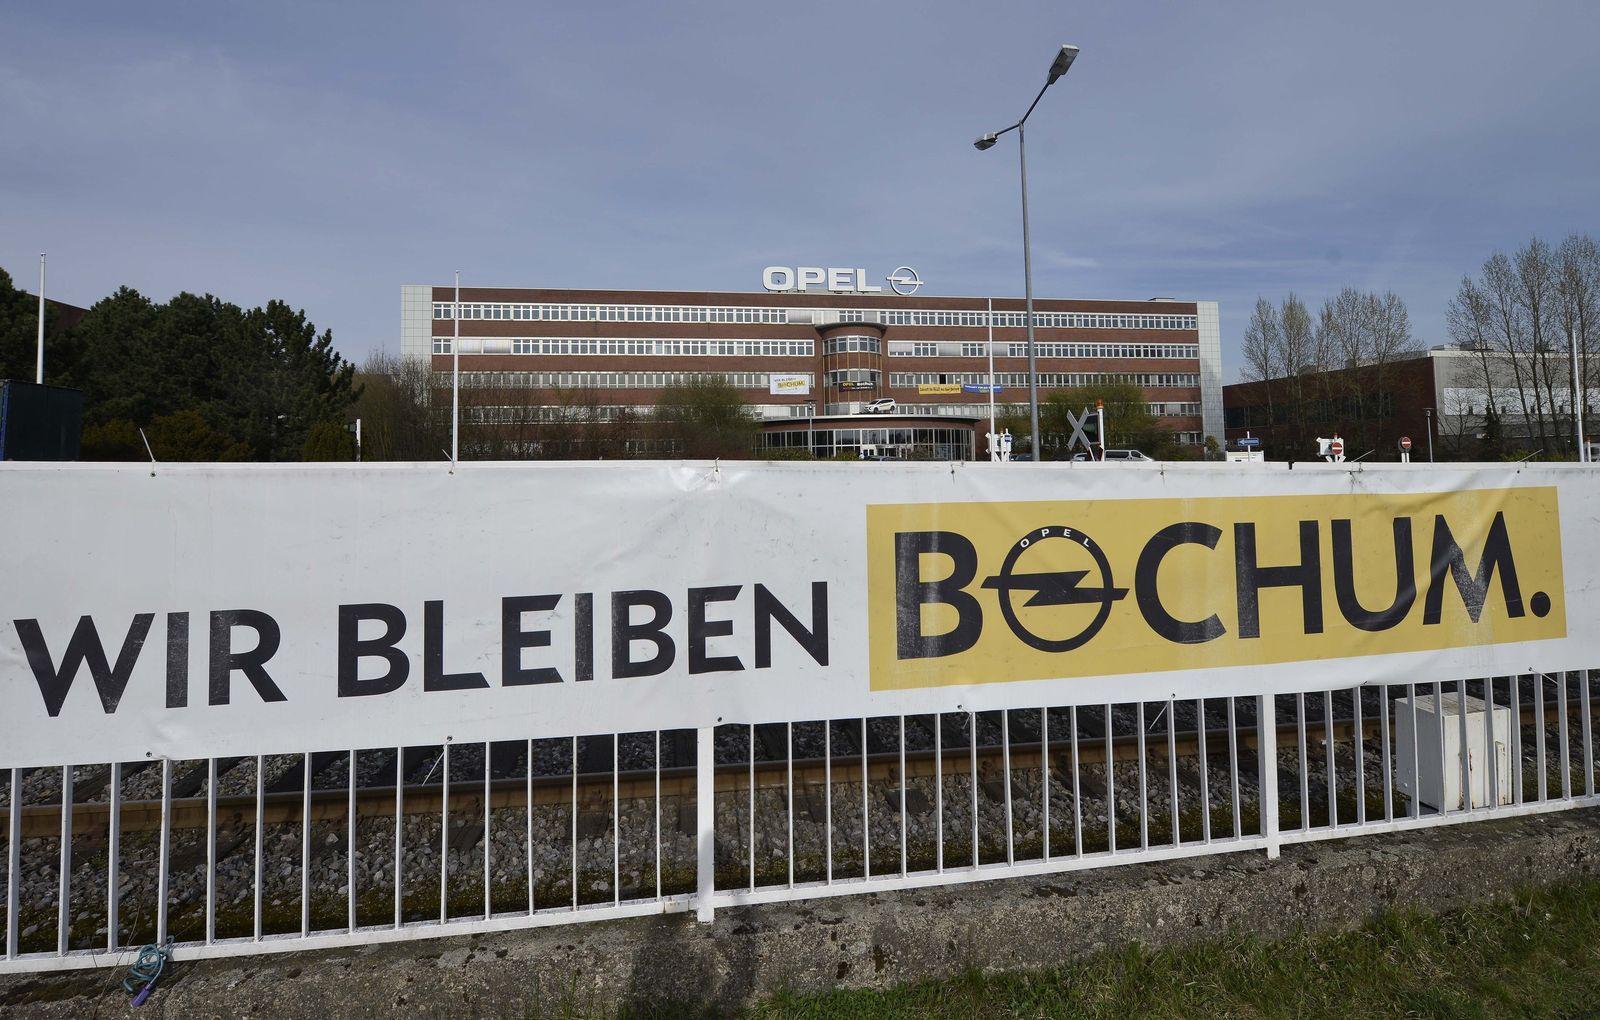 Germany General Motors Opel